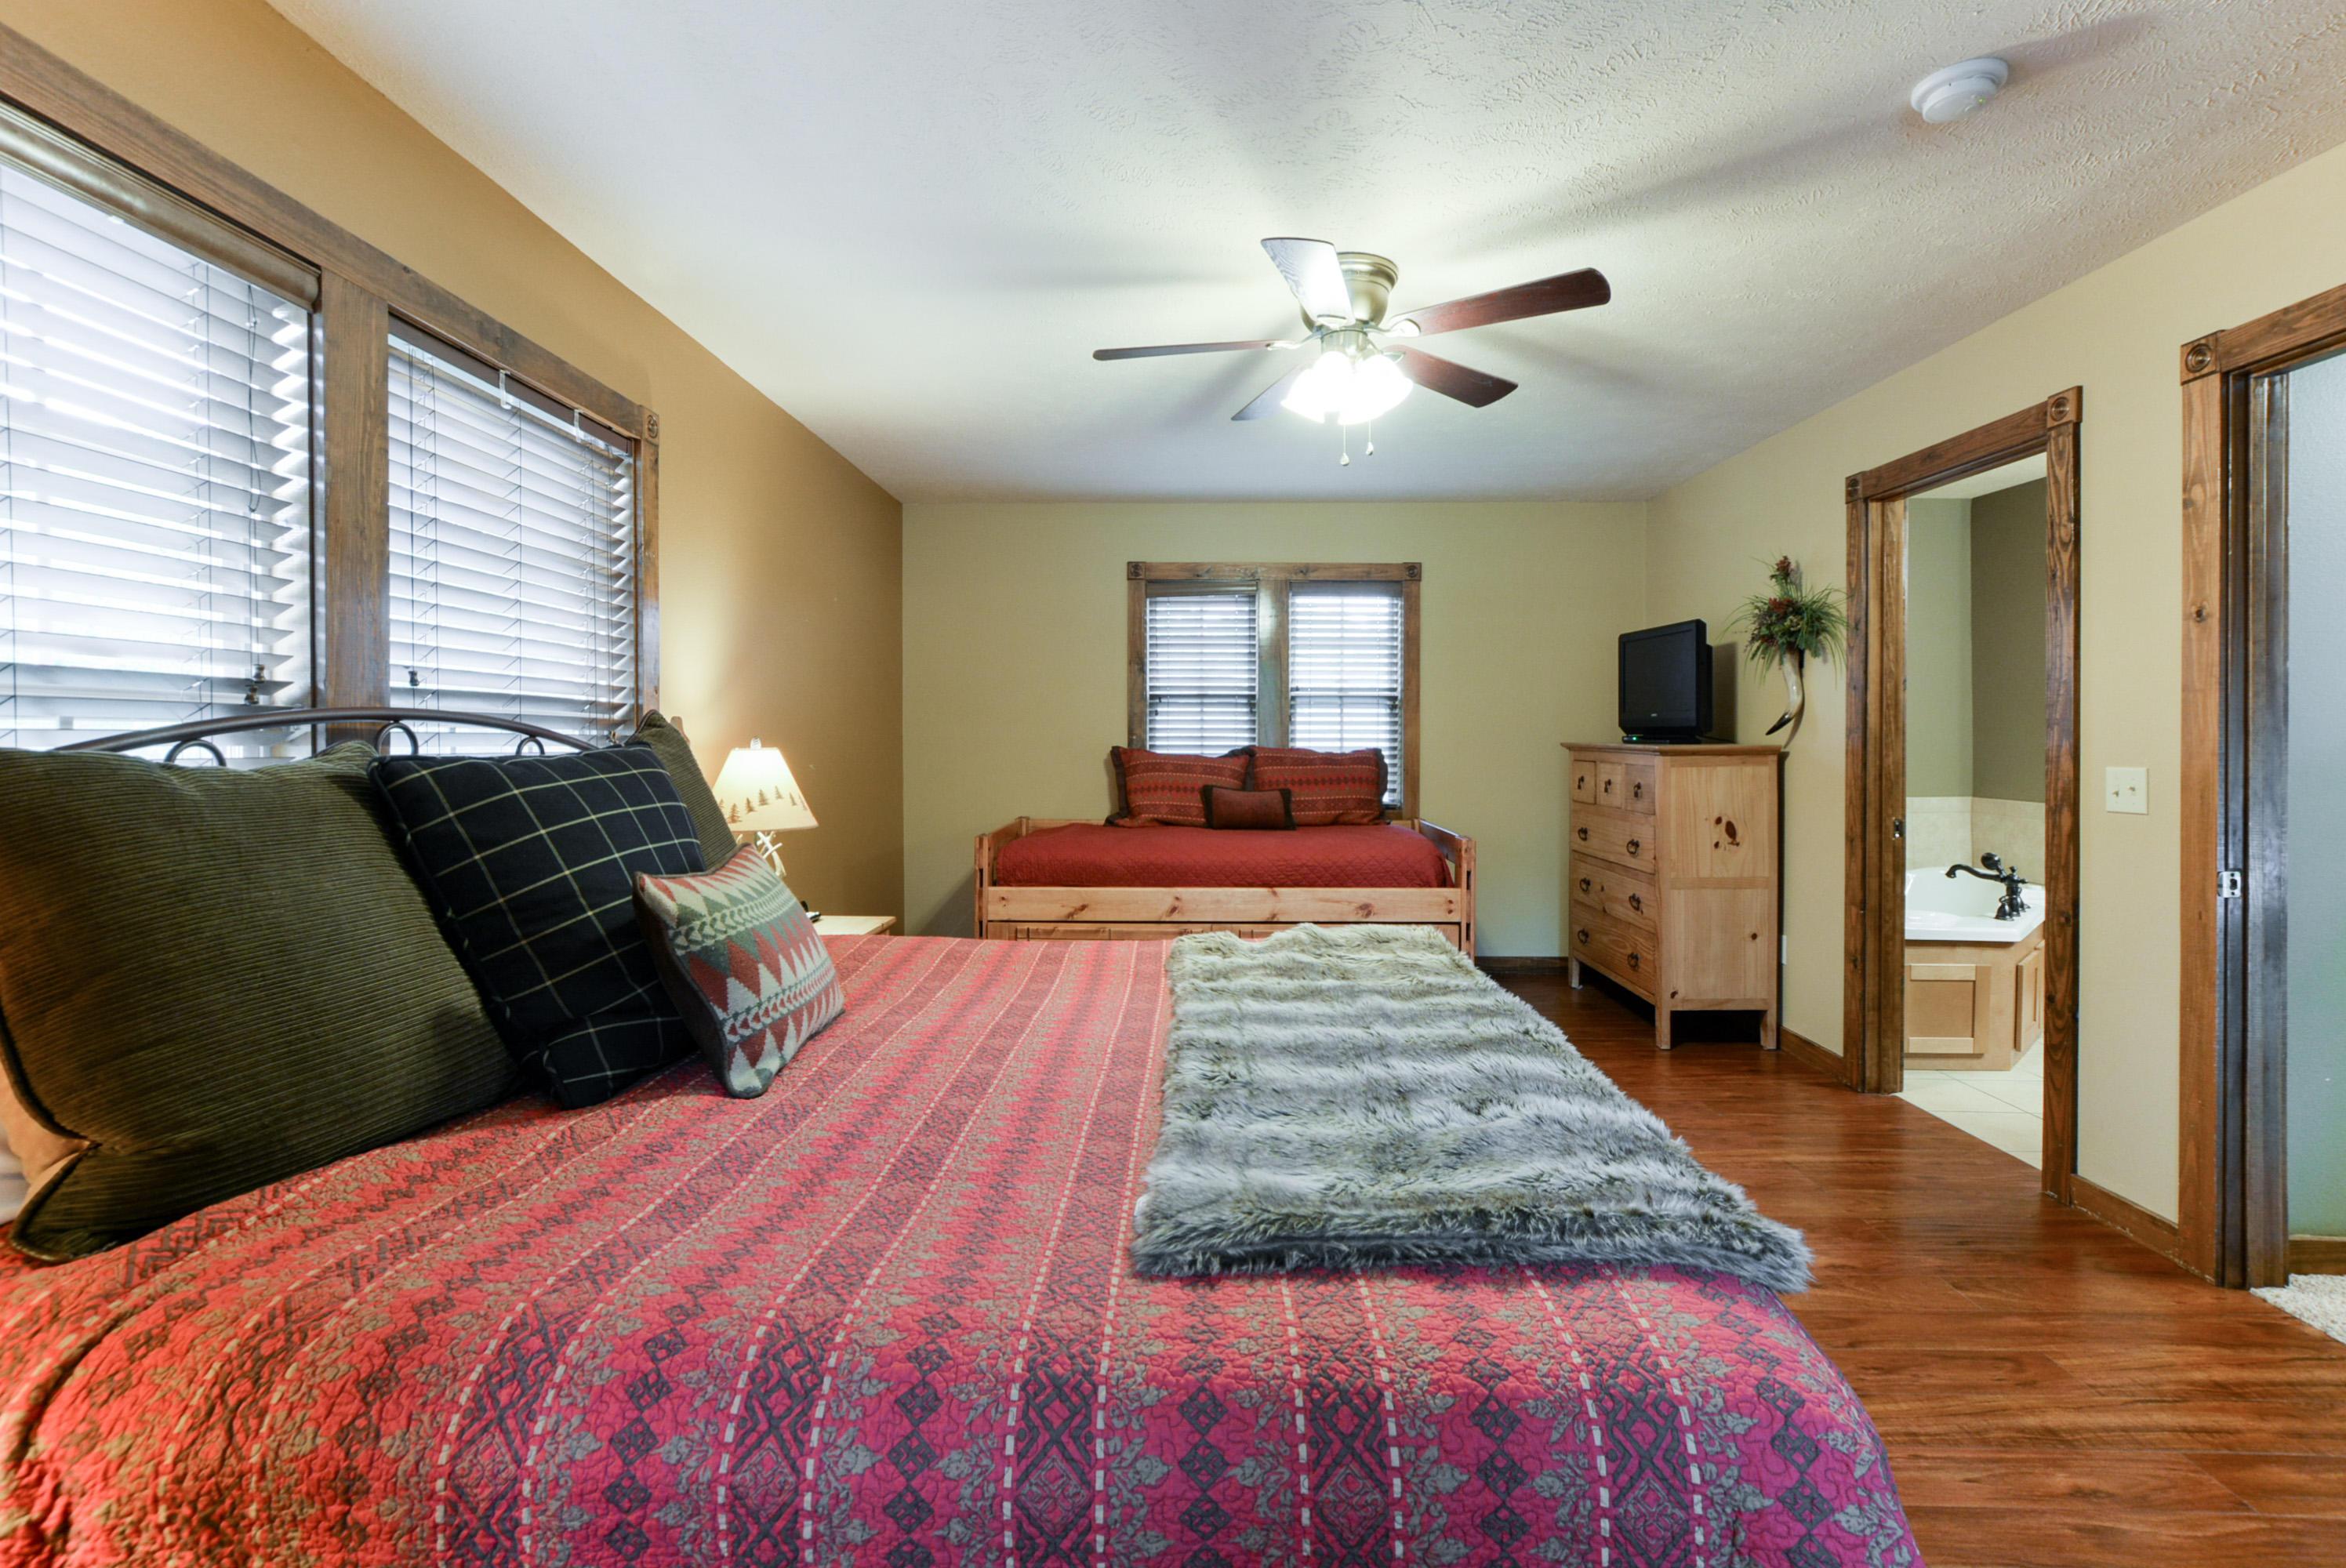 69 Deerfield Lane, Lodge Branson West, MO 65737